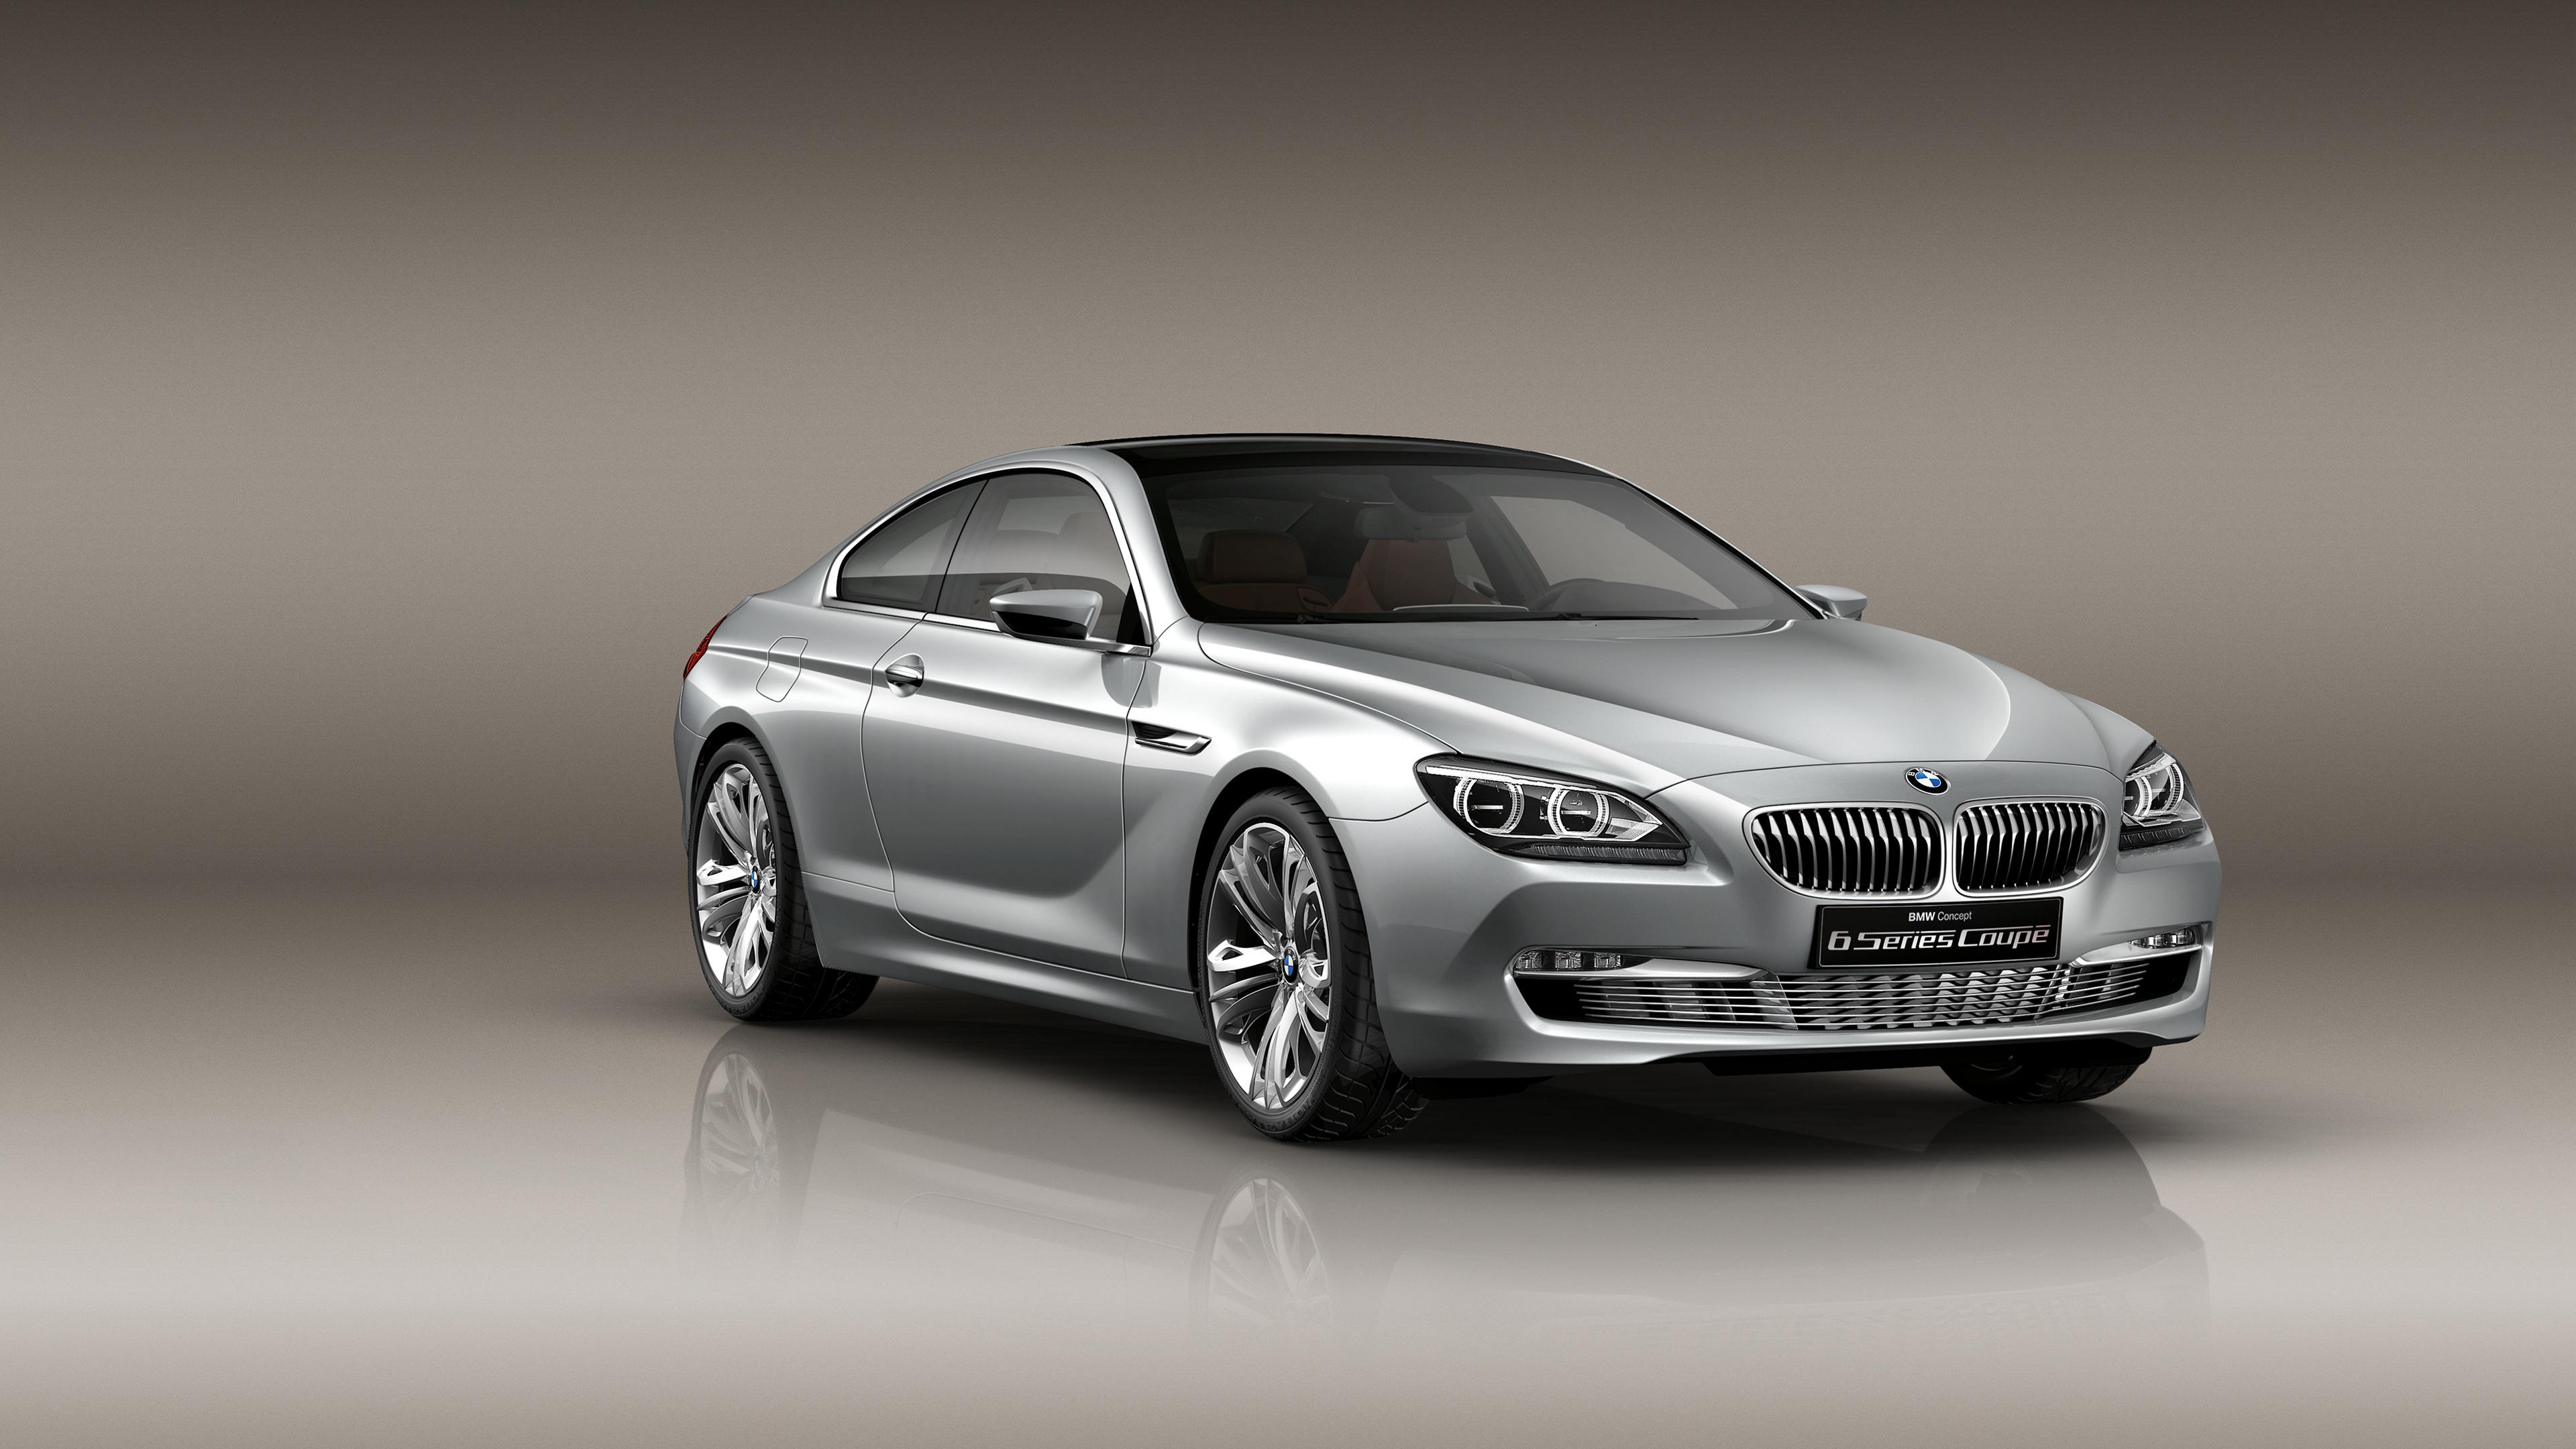 BMW 6 Series Gran Coupe F13 Wallpaper | HD Car Wallpapers ...